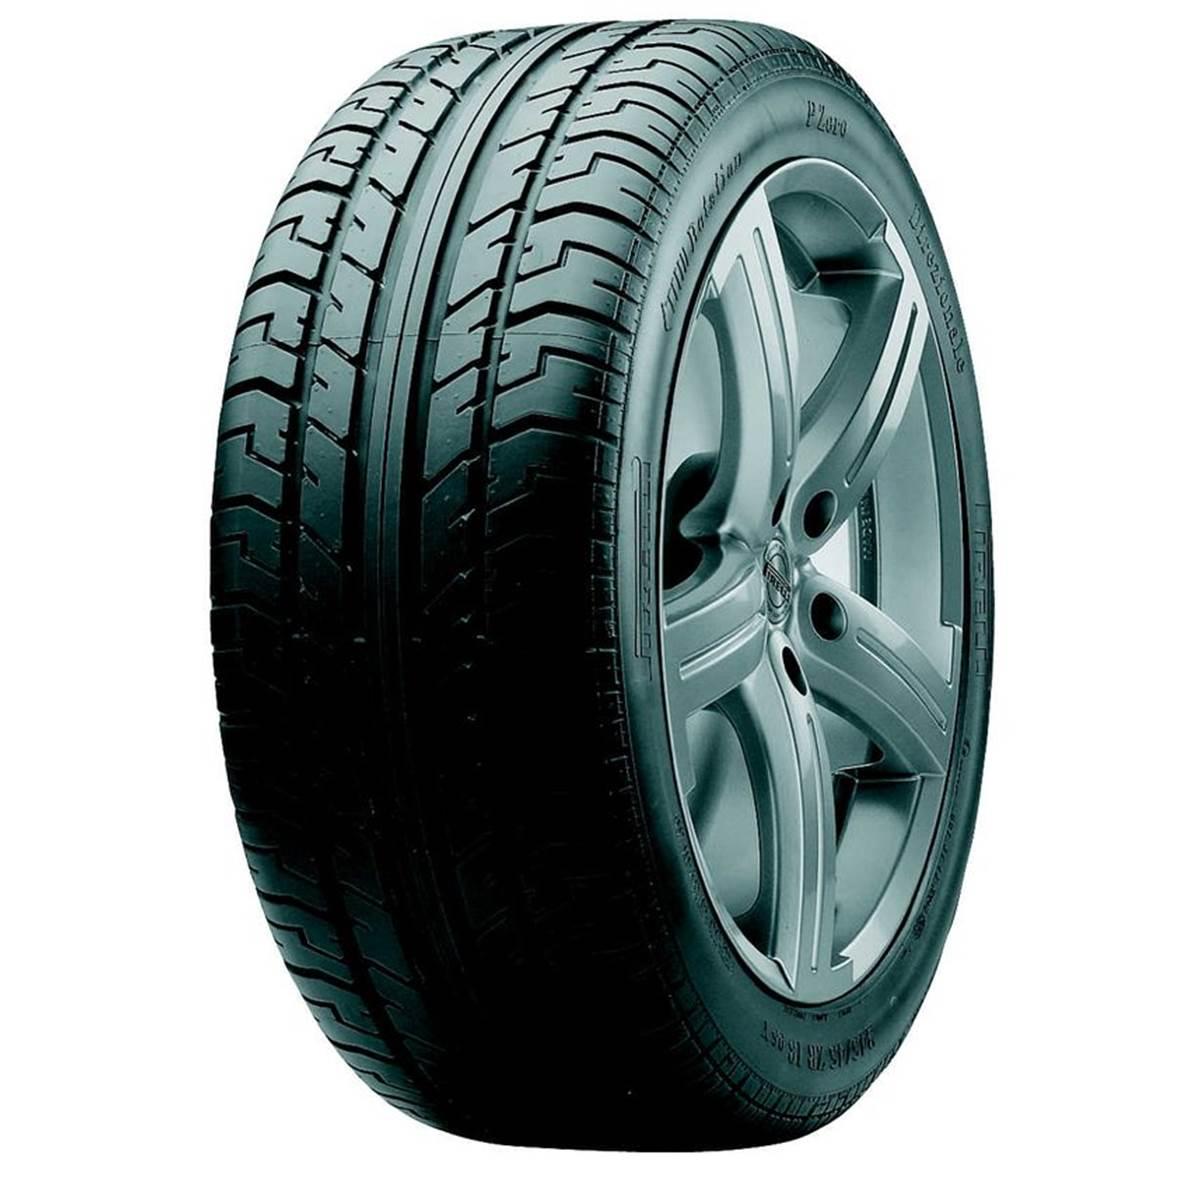 Pneu Pirelli 245/45R18 96Y Pzero Direzionale